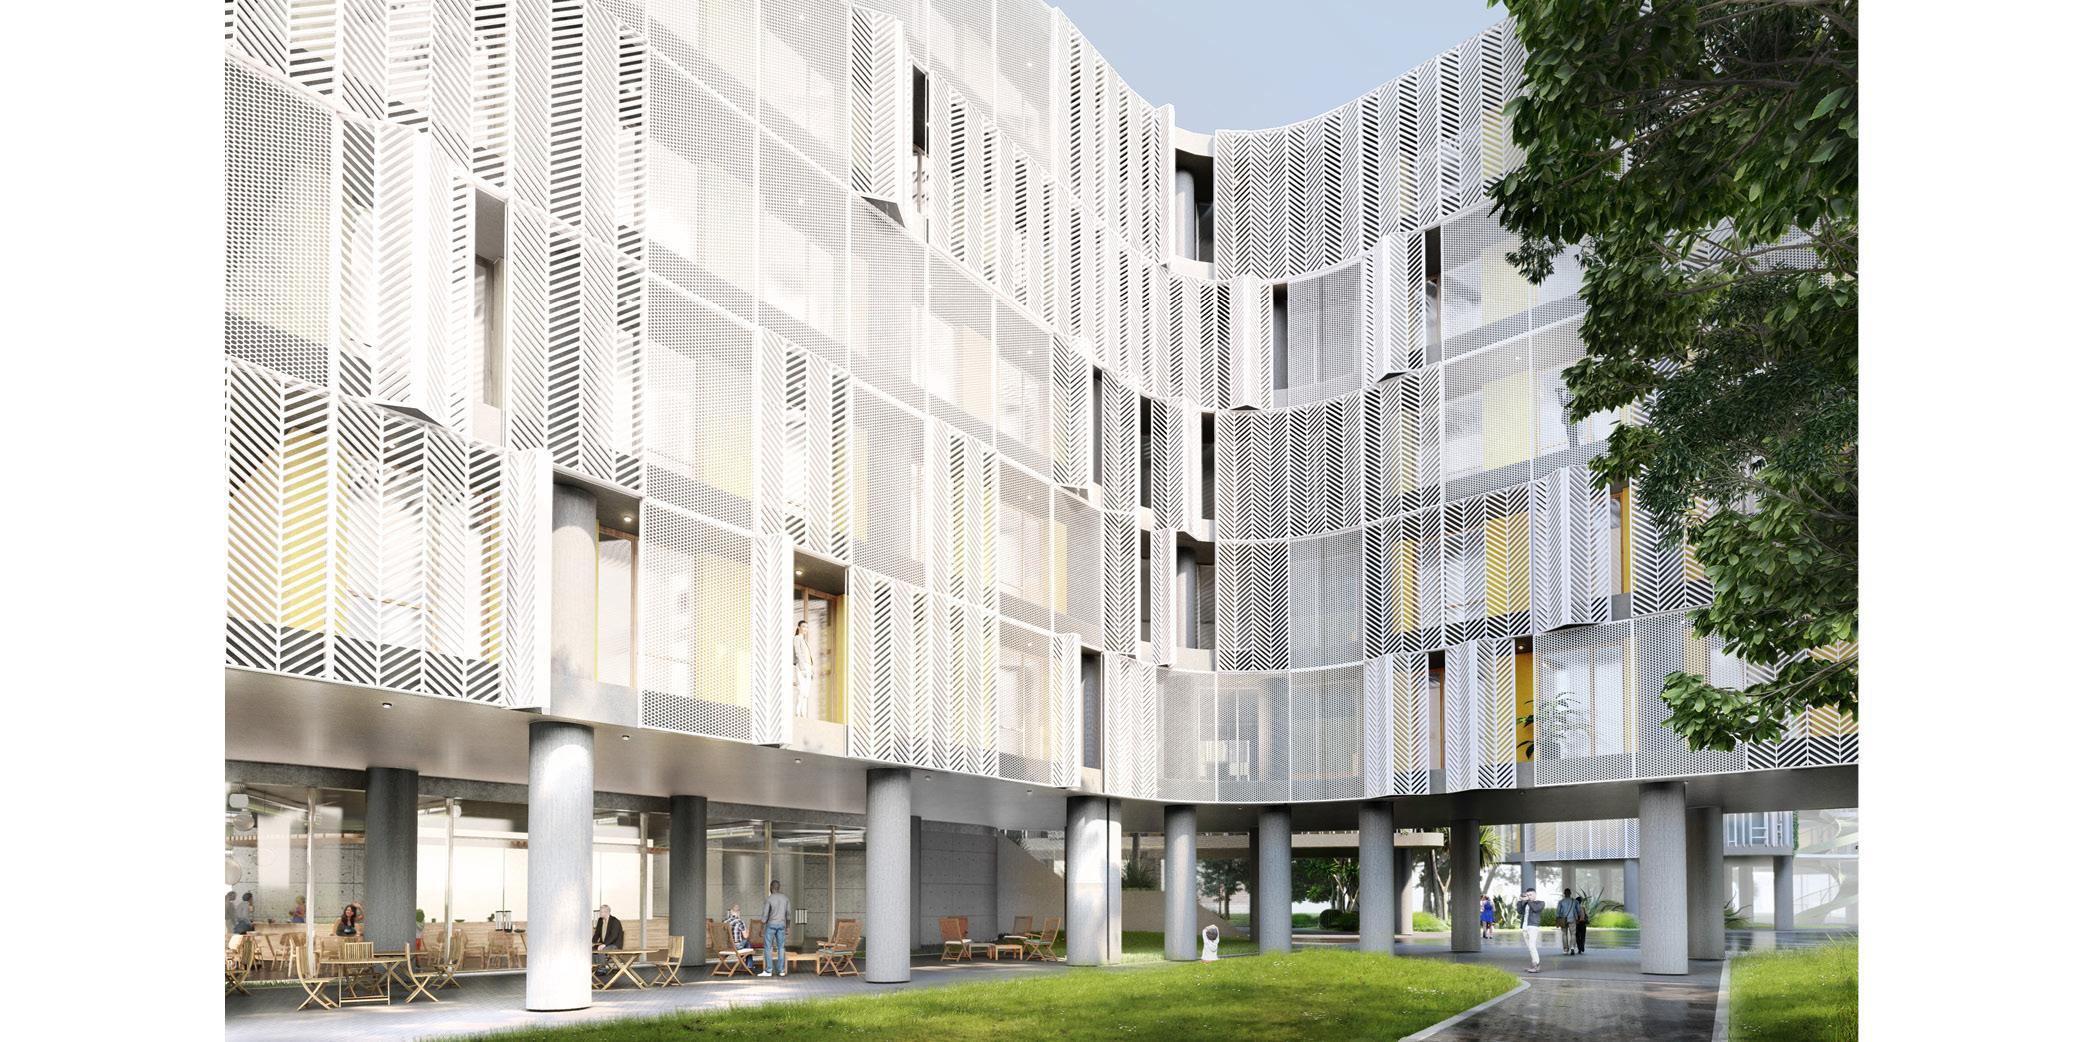 OCA architects Dormitories of the Cyprus University of Technology in Limassol - Κοιτώνες Κύπρος Λεμεσός Hernan Lleida Ruiz Bernardo Garcia Morales2